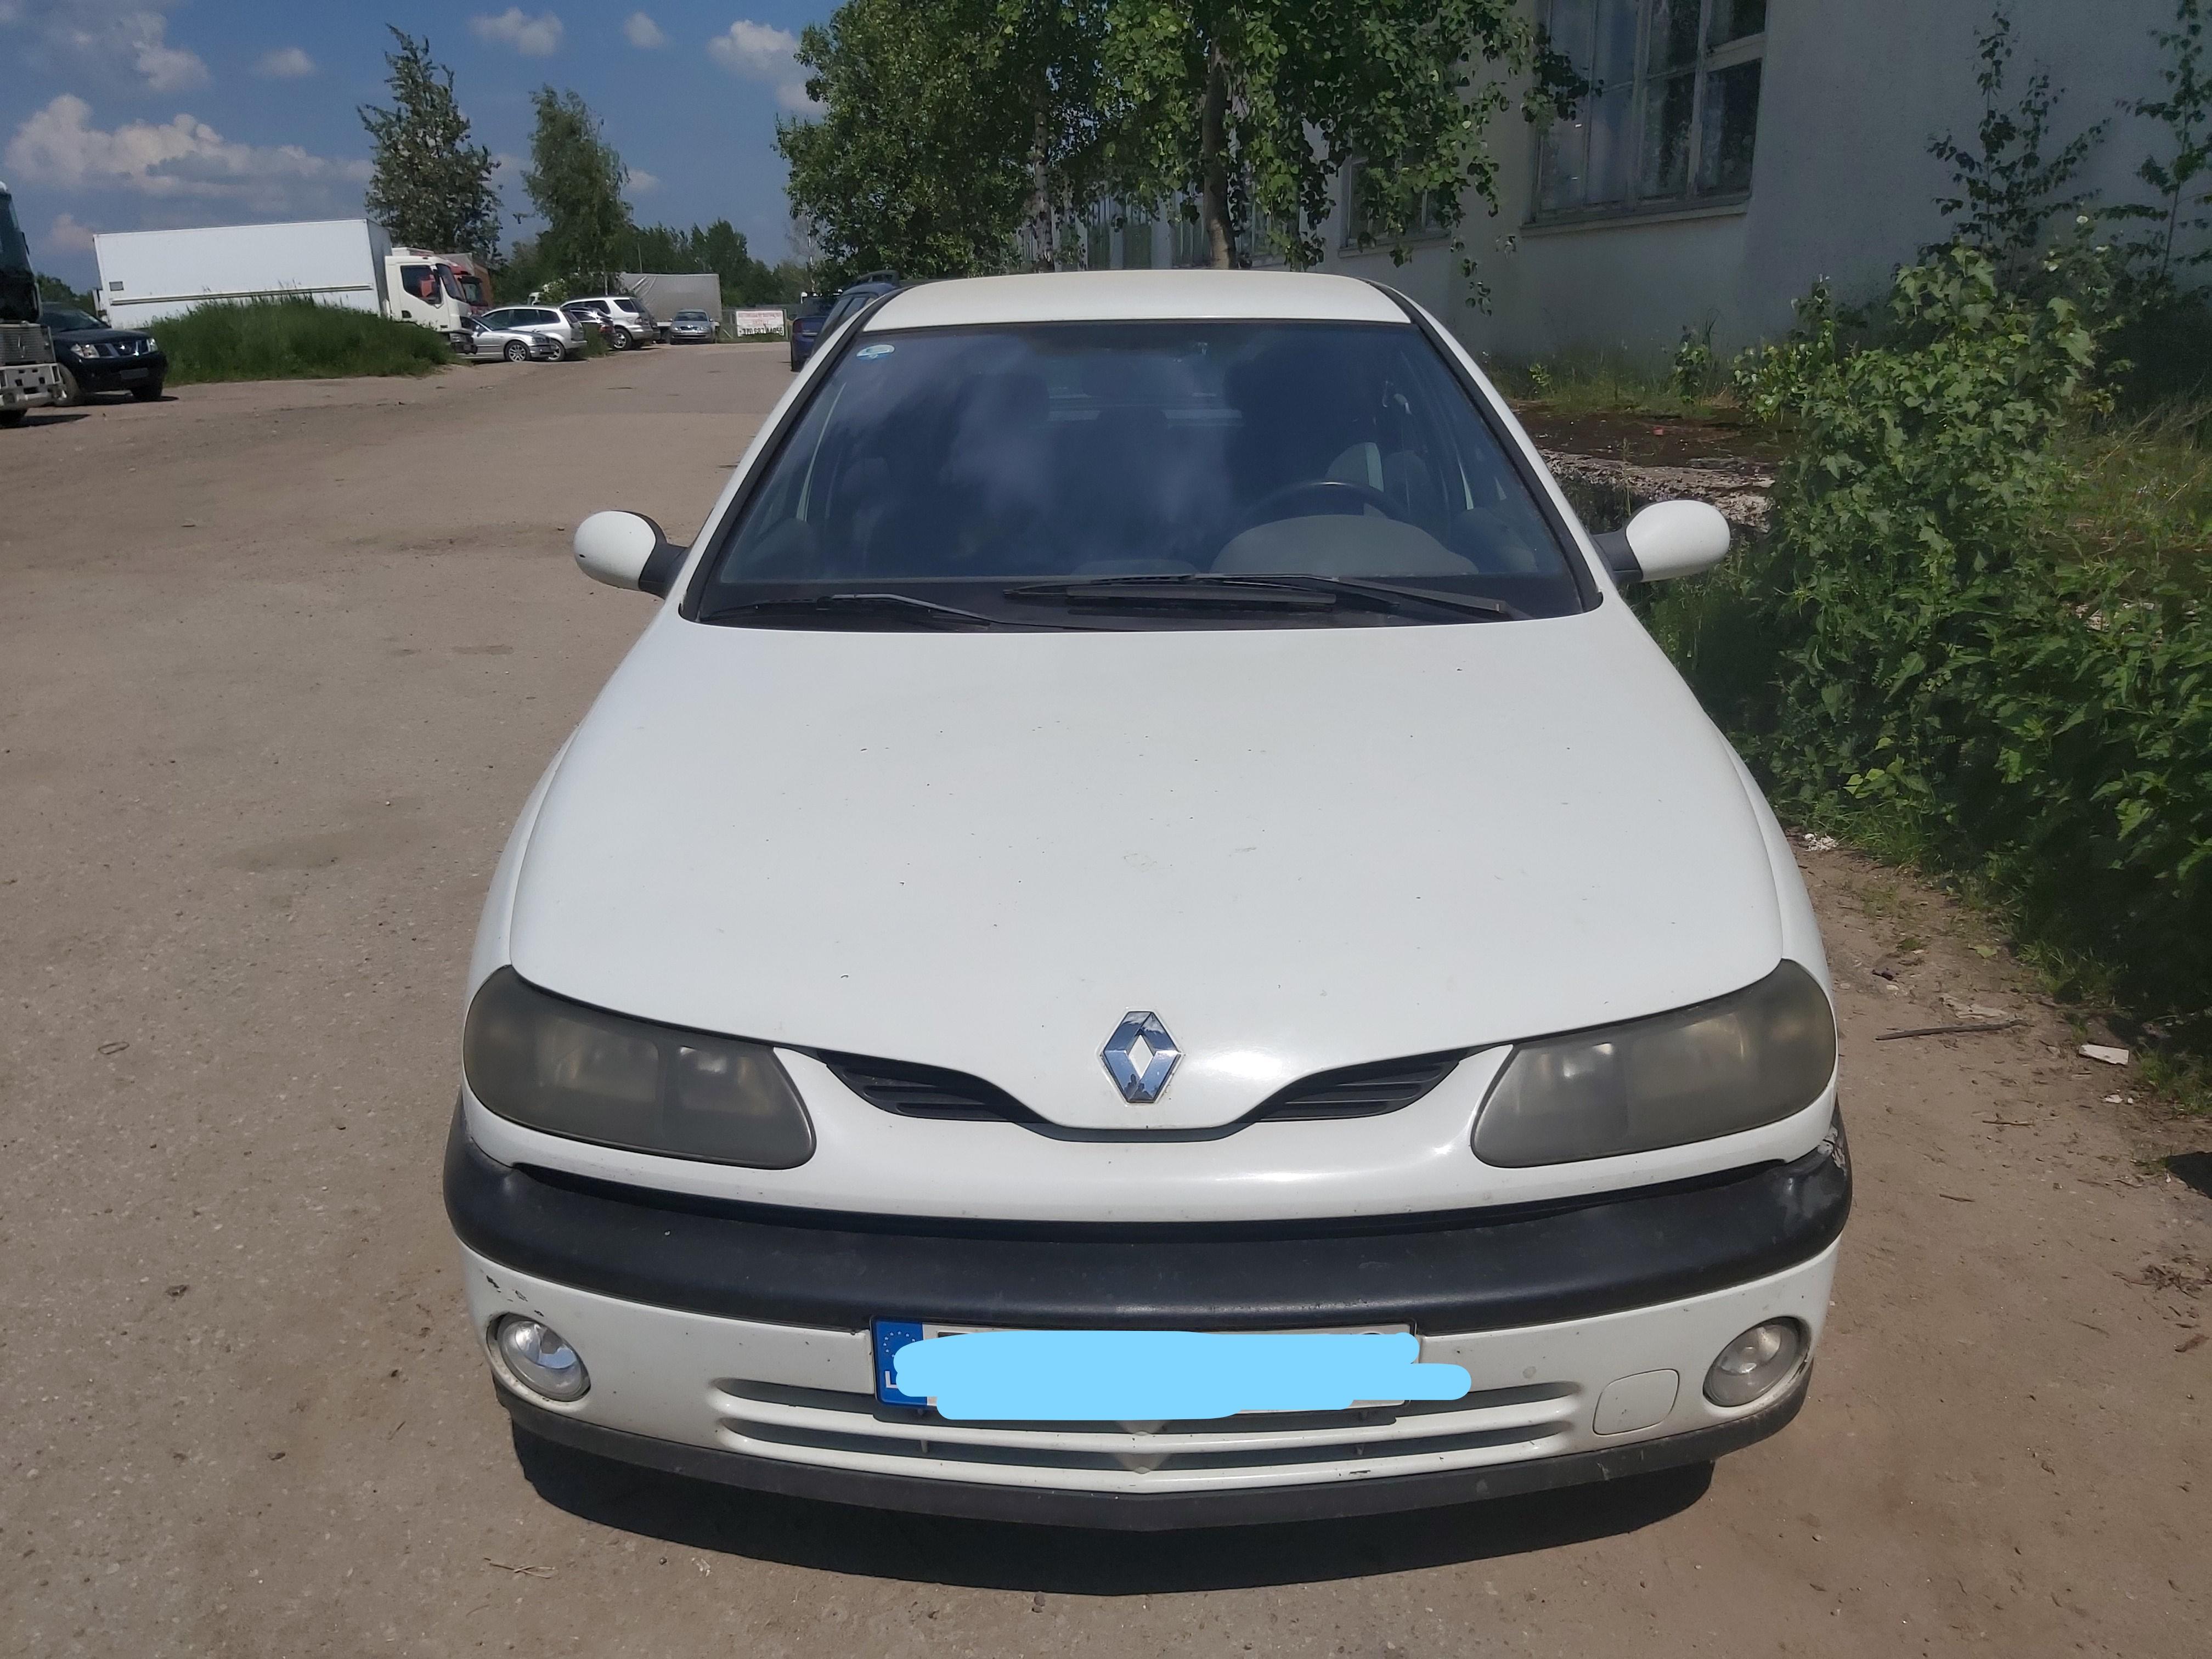 Foto-3 Renault Laguna Laguna, 1994.01 - 2001.03 1999 Benzinas 1.8